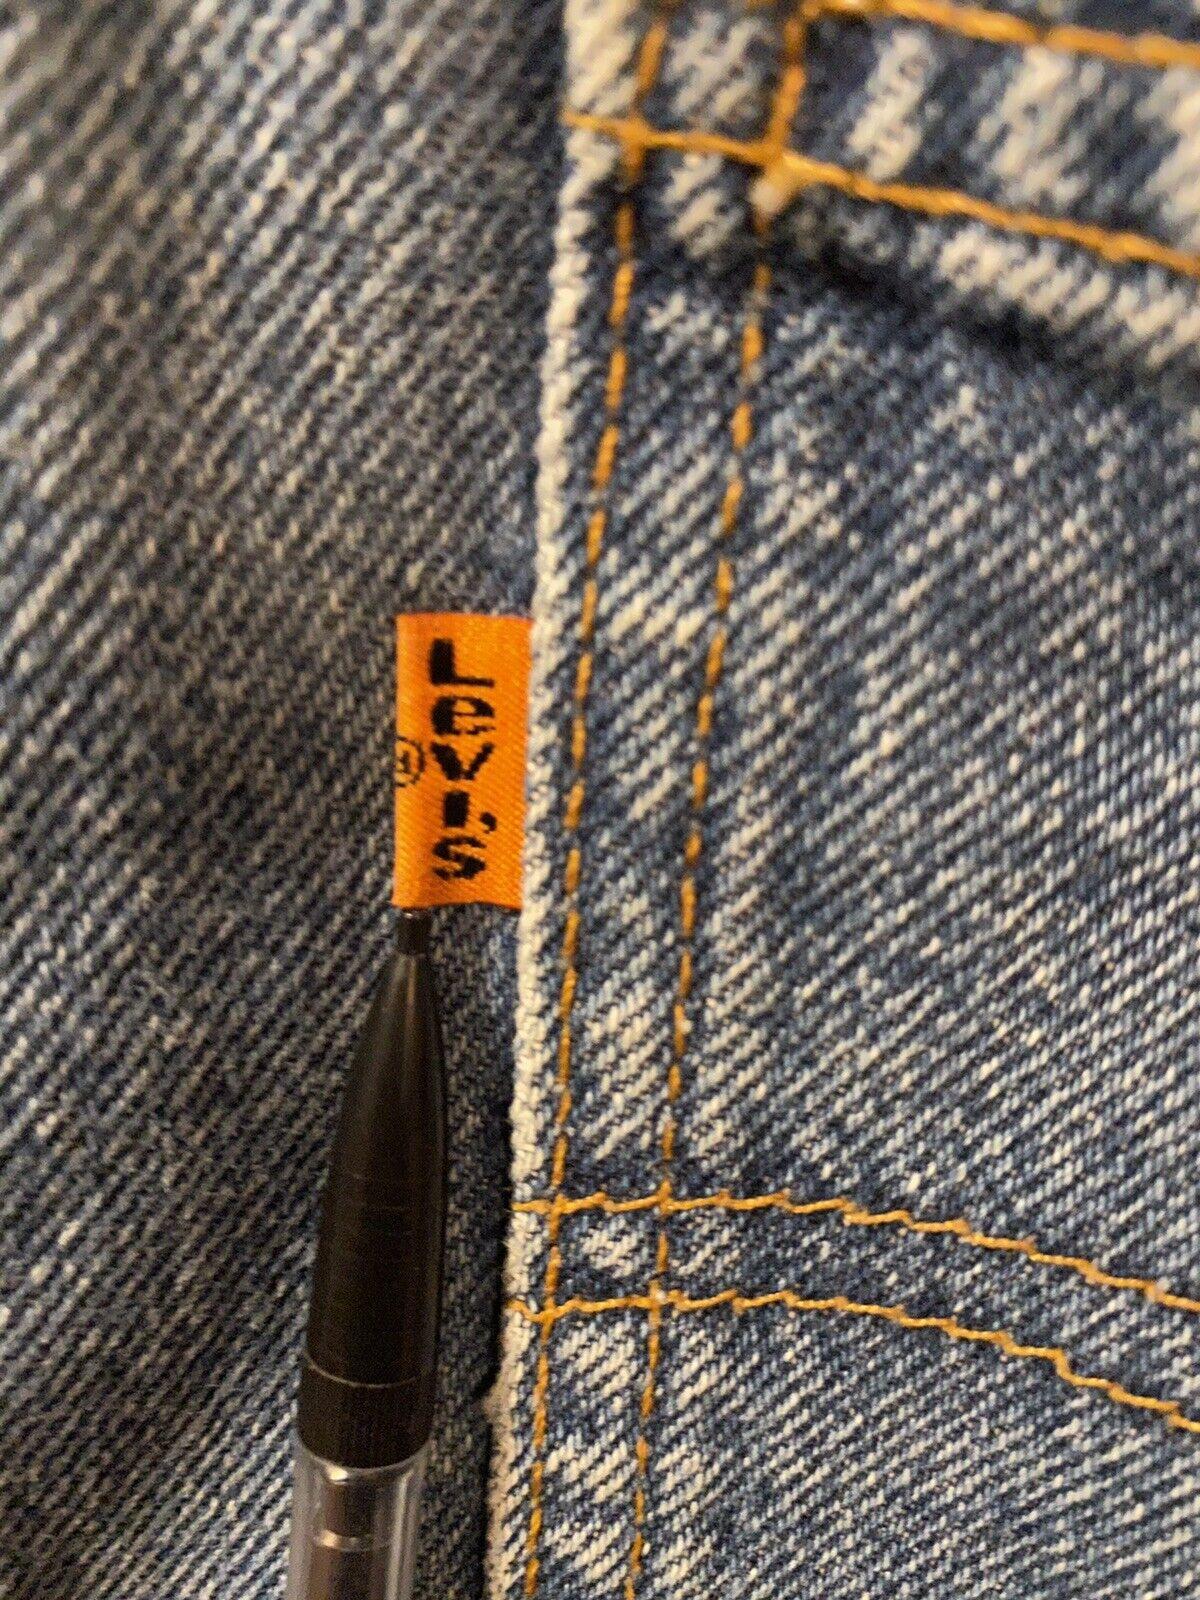 Vintage Levis (Orange Tab) Made In USA - image 3